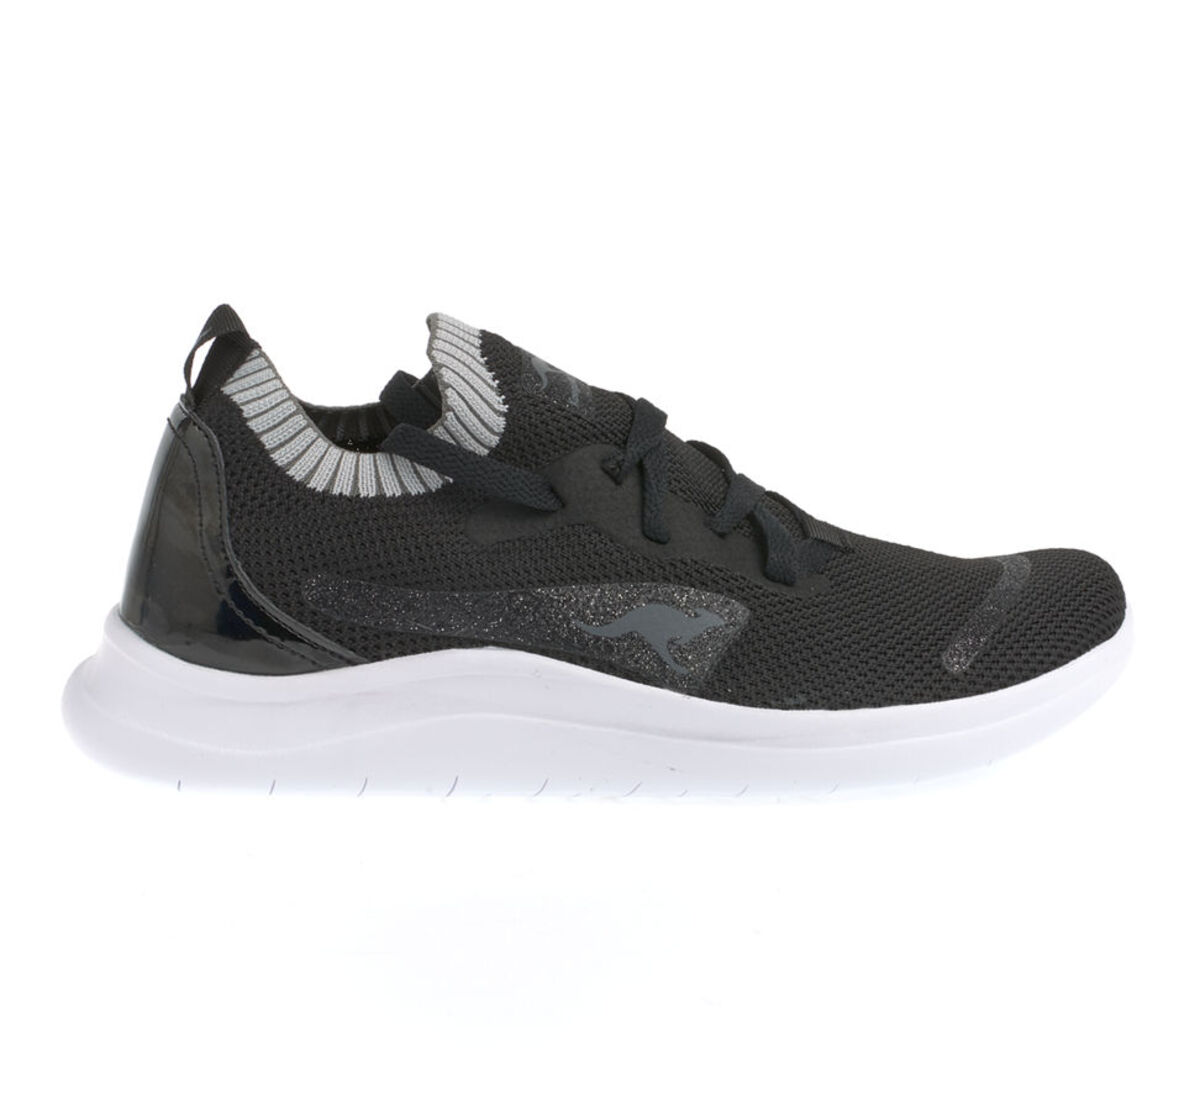 Bild 3 von Kangaroos Sneaker - KG-LIMBER SII